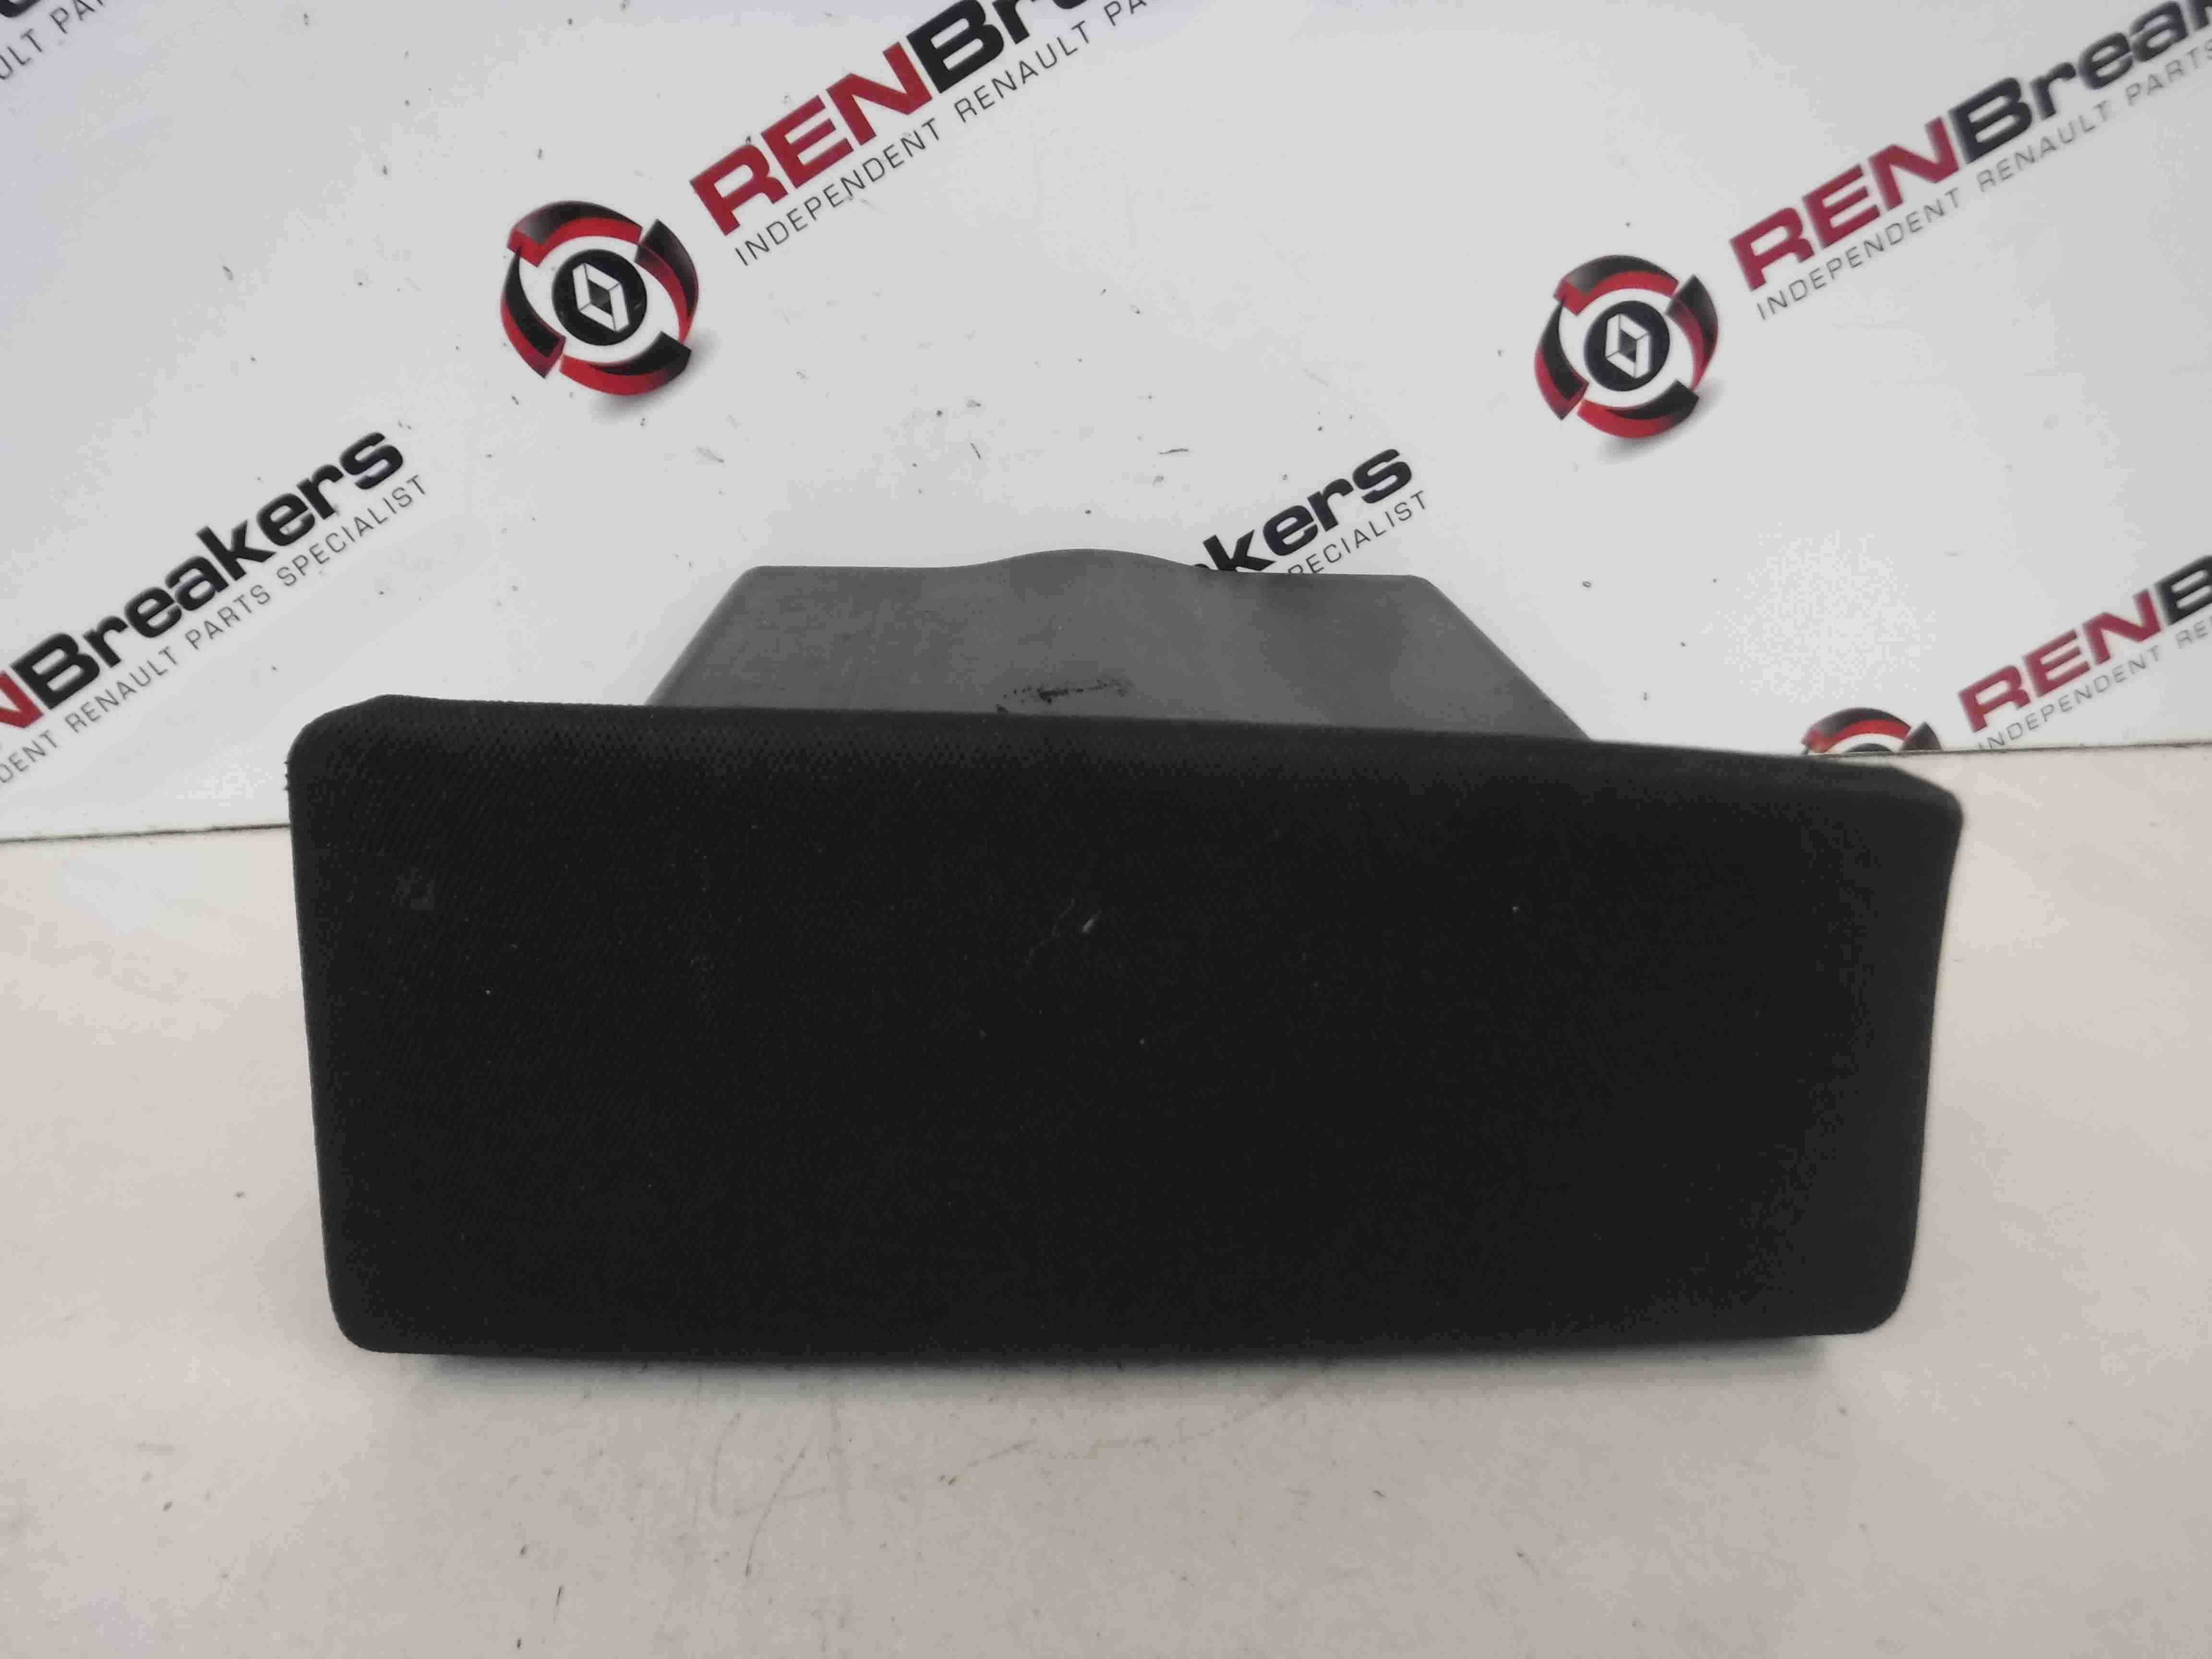 Renault Megane Scenic 2003-2009 NS OS Door Pocket Glove Box Compartment Dark